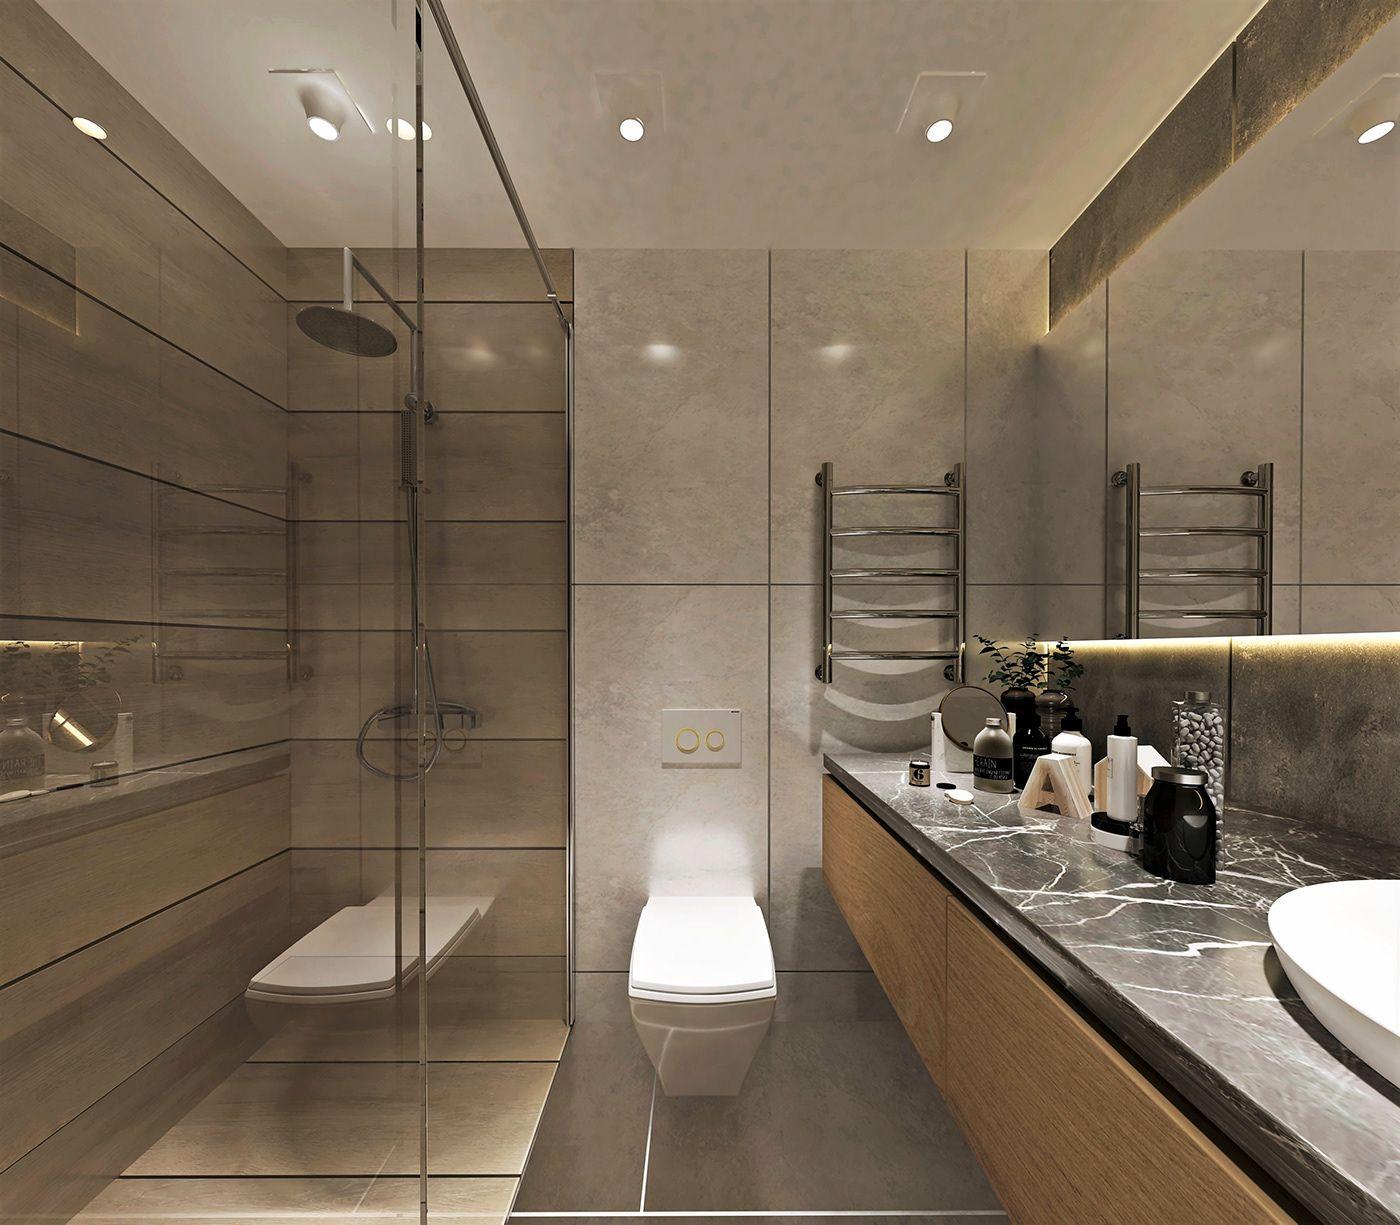 3d Models Bathroom Furniture 8 Free Download Bathroom Model